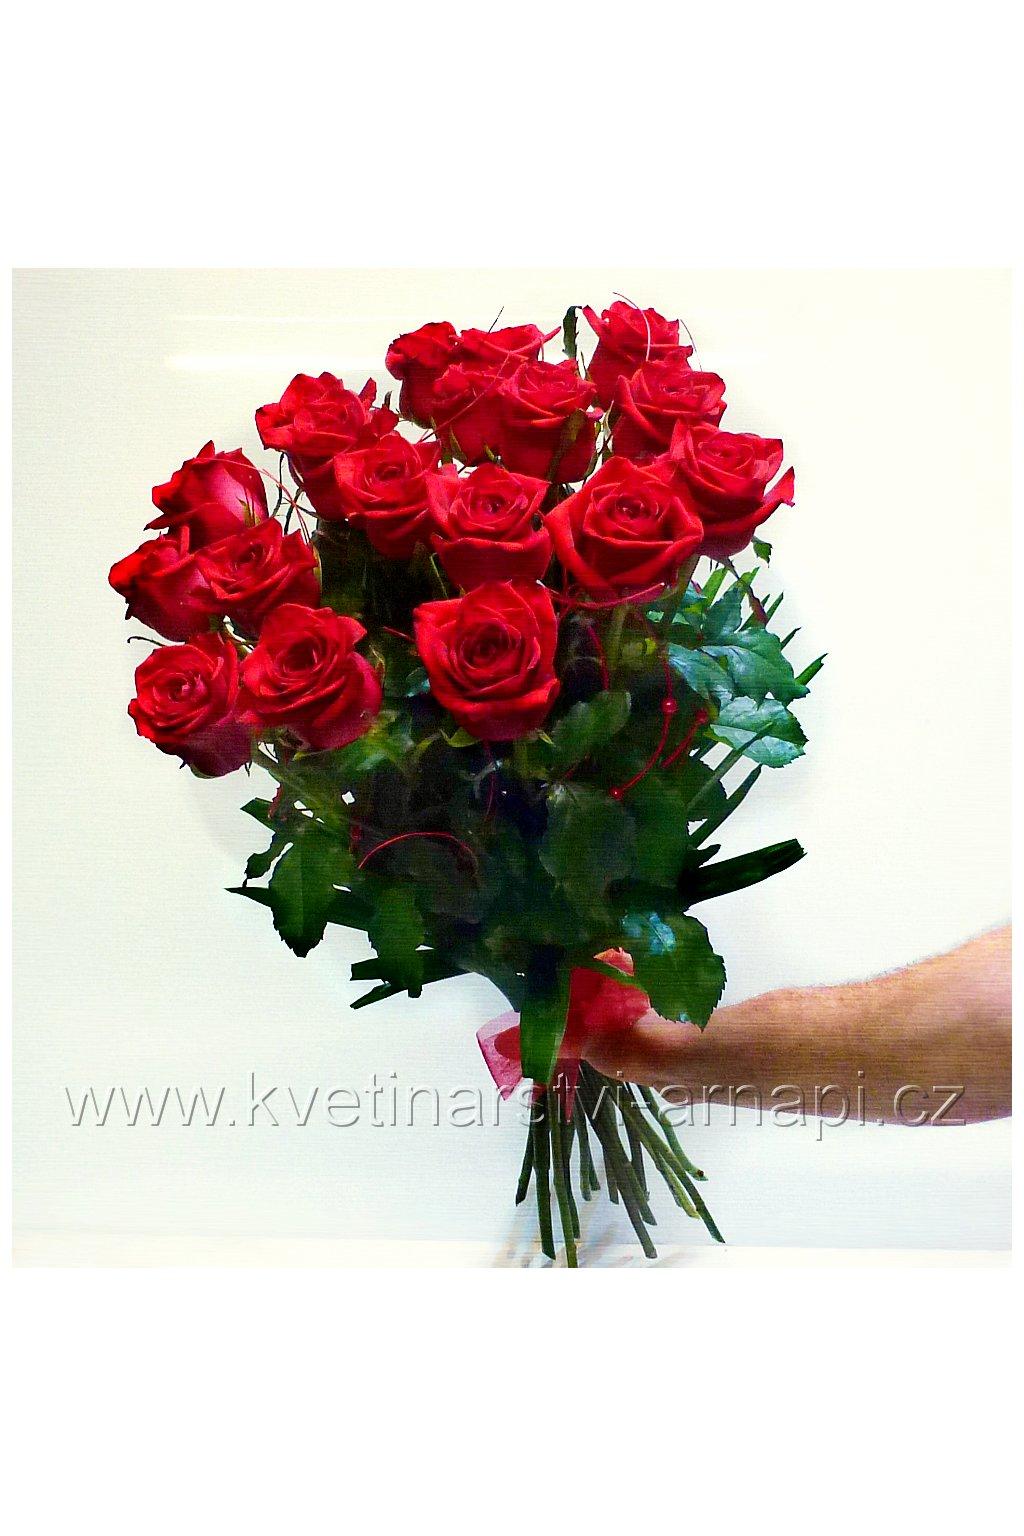 kytice ruzi darkova prodej online kvetinarstvi arnapi